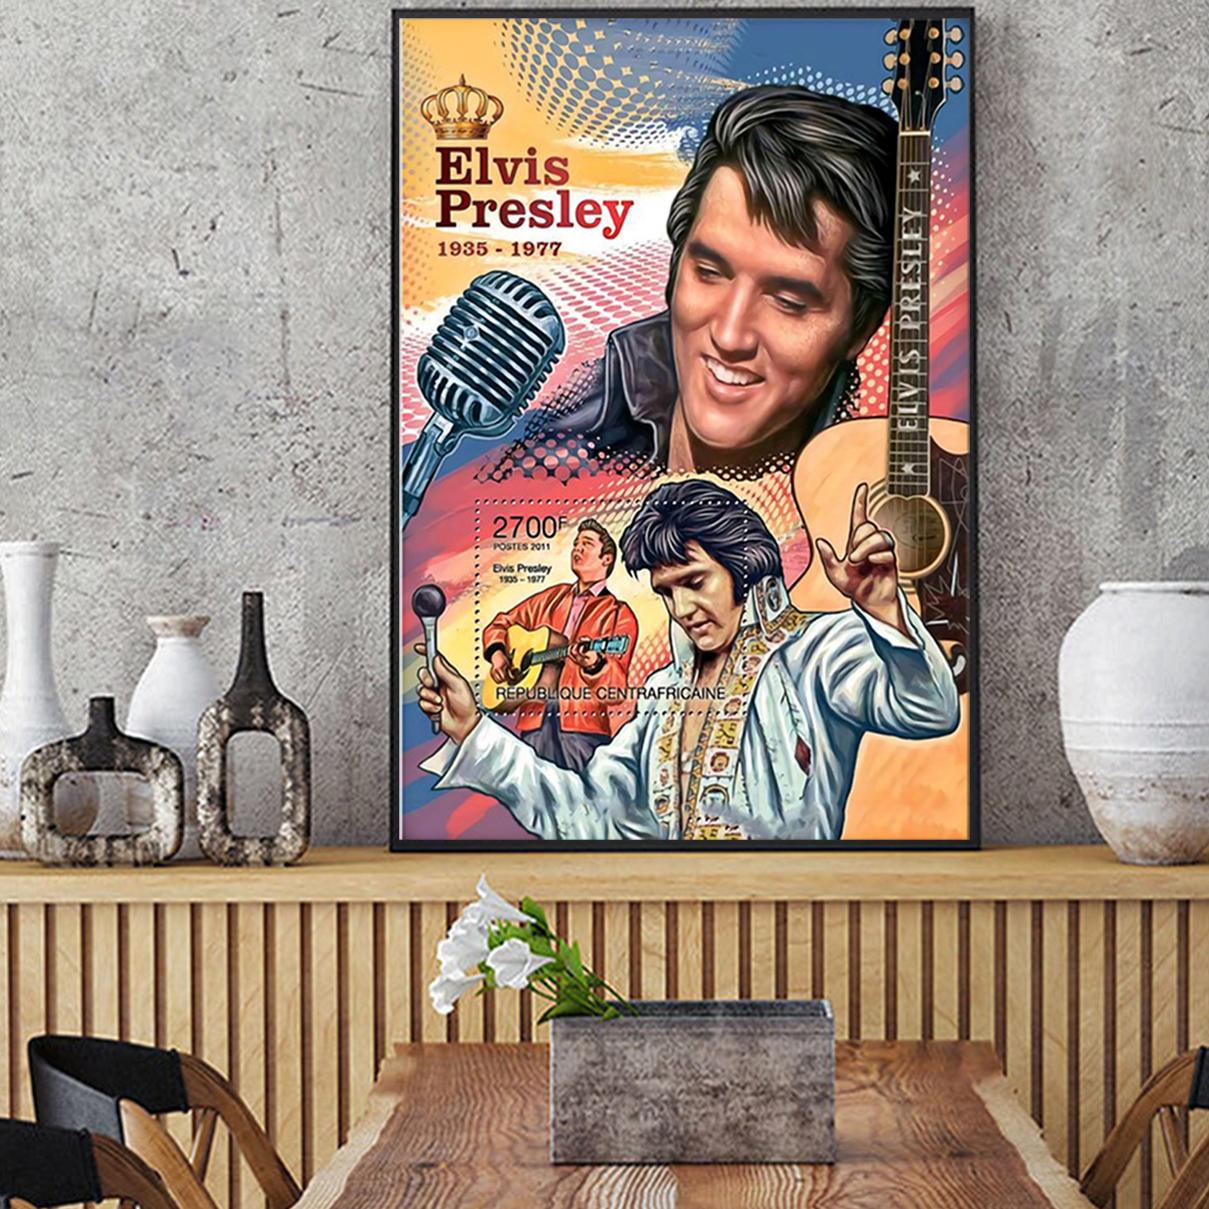 Evis presley king of RnR poster A3